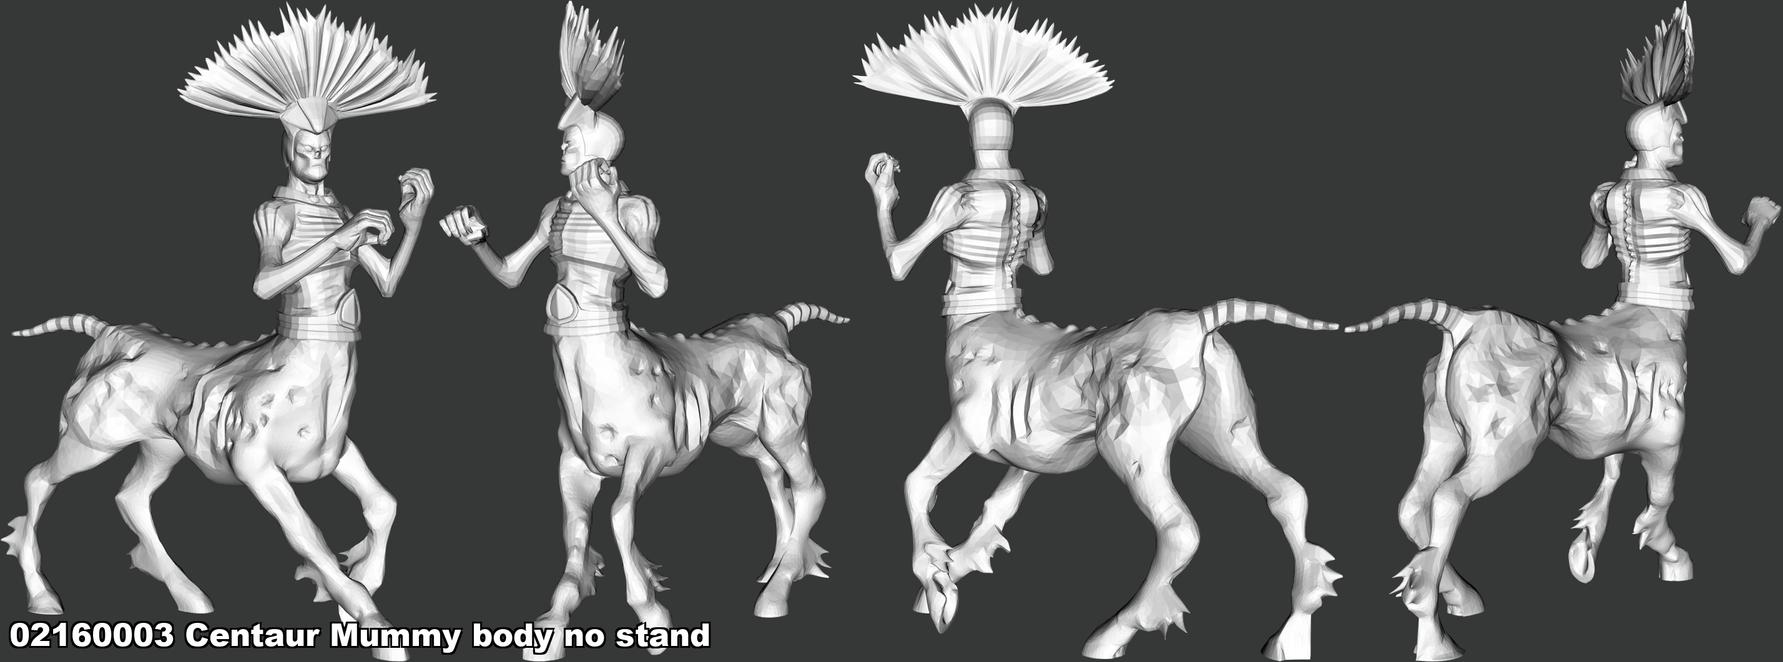 02160003 Centaur Mummy body no stand.png